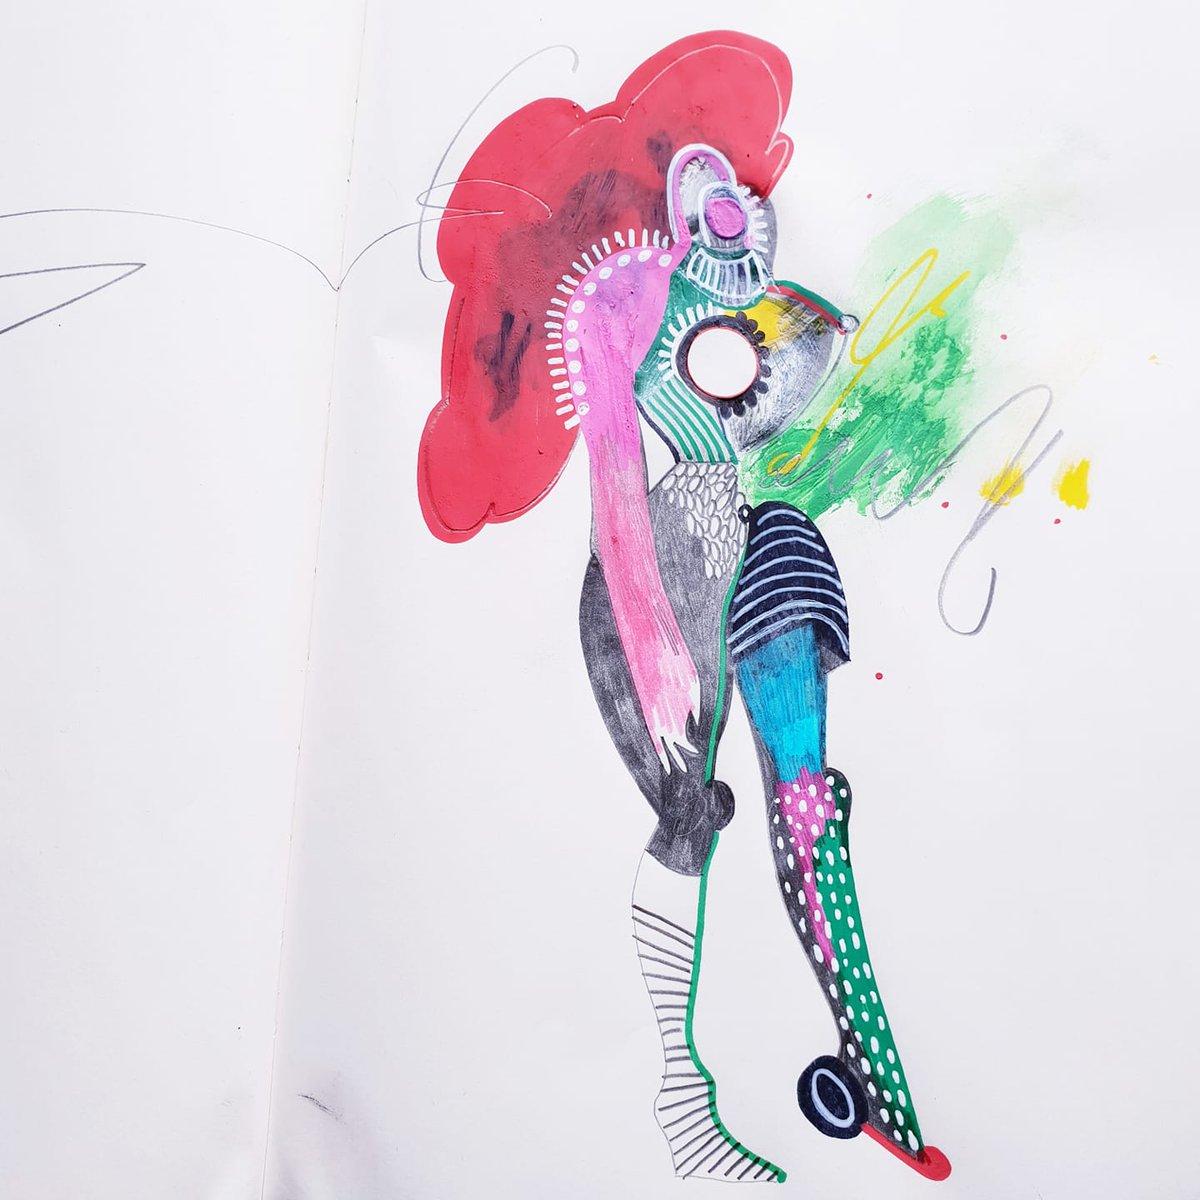 'Warrioress' - a drawing I did a little while ago and still love :-)   * * * * * *  #drawing #illustration #illustrator #art #wallart #artprints #warrior #warrioress #warriorspirit #originalart #metisgebo #artist #fashionillustration pic.twitter.com/WGfQSSJ3aY